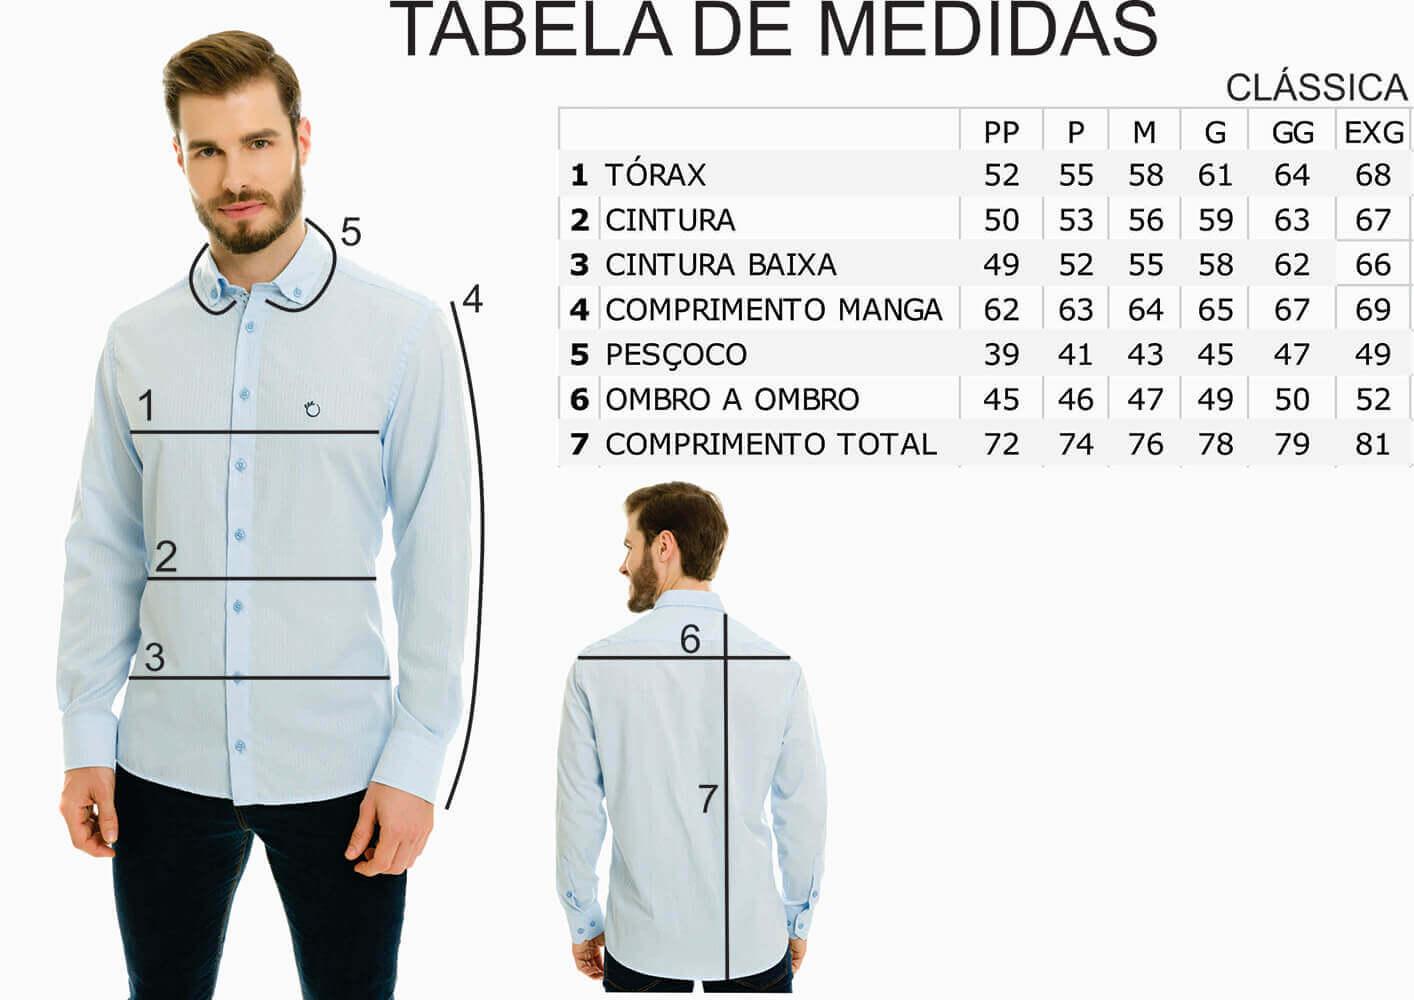 Camisa Social Masculina Olimpo Lisa com Bolso Manga Longa Branca